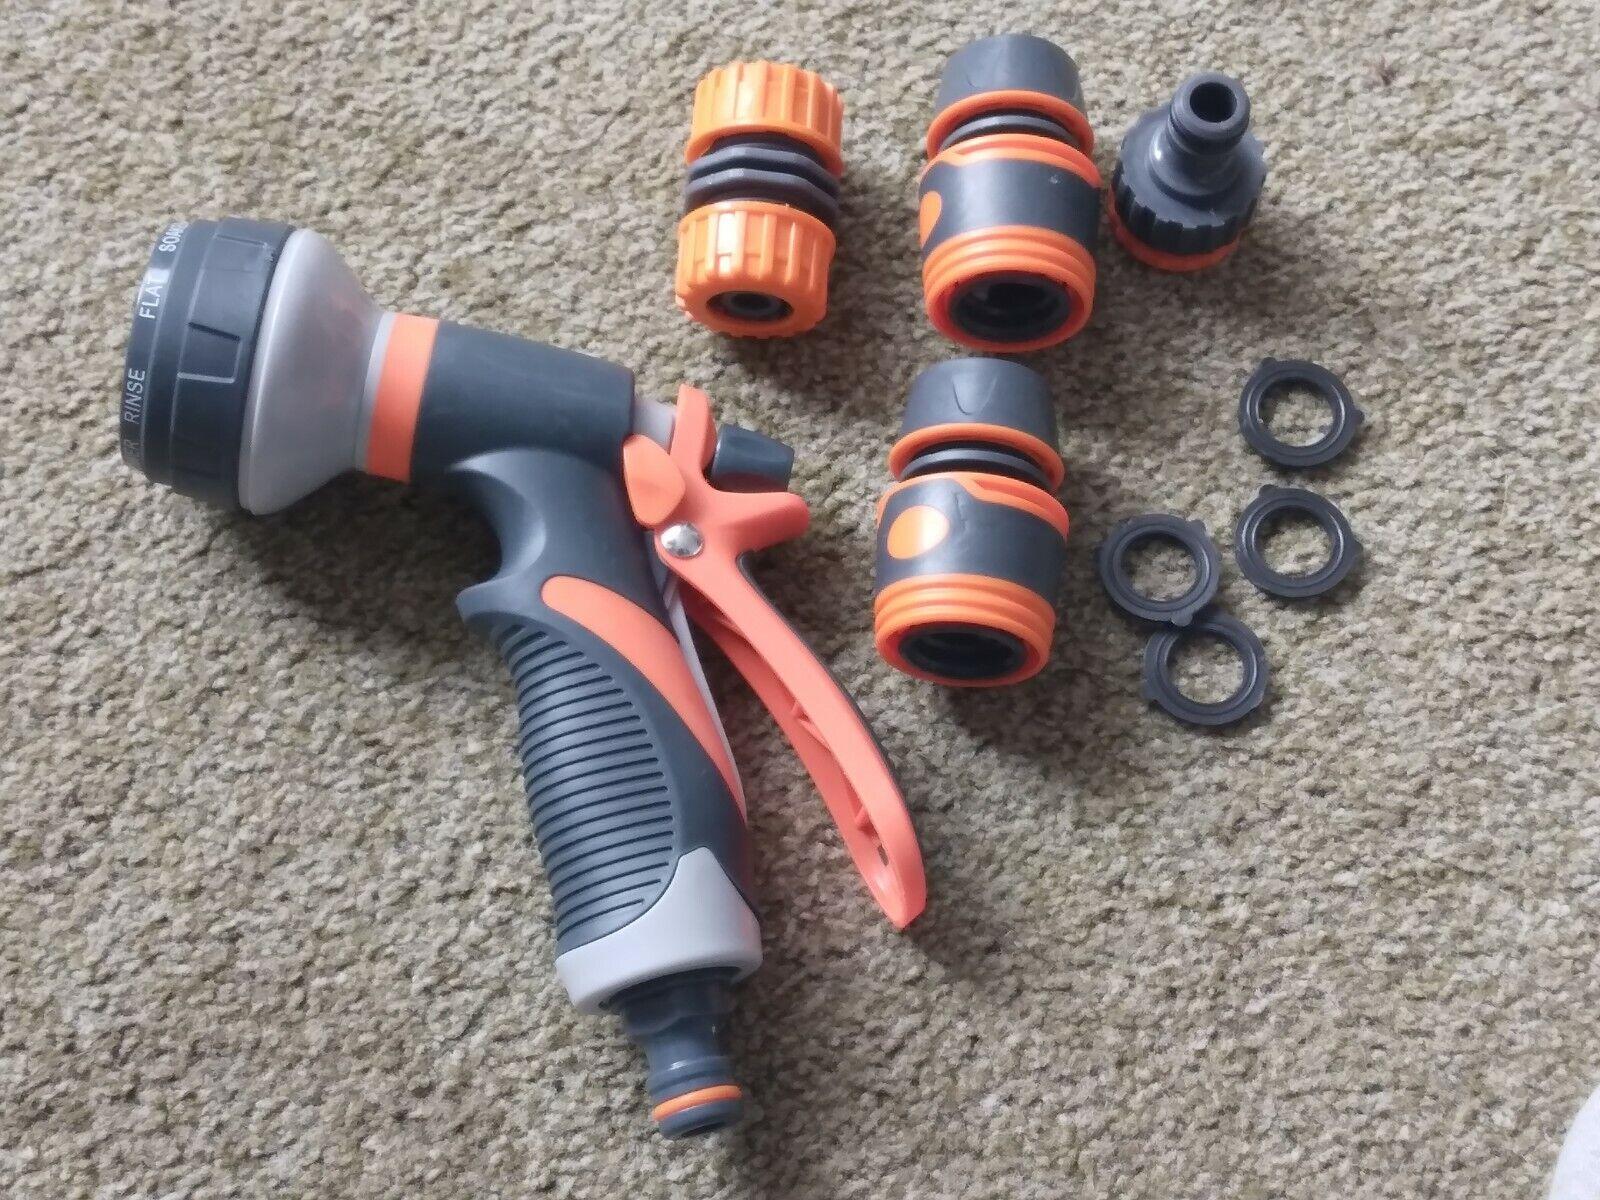 8 Functions Garden Hose Pipe Spray Gun Nozzle Head Adapter Connectors & Fittings